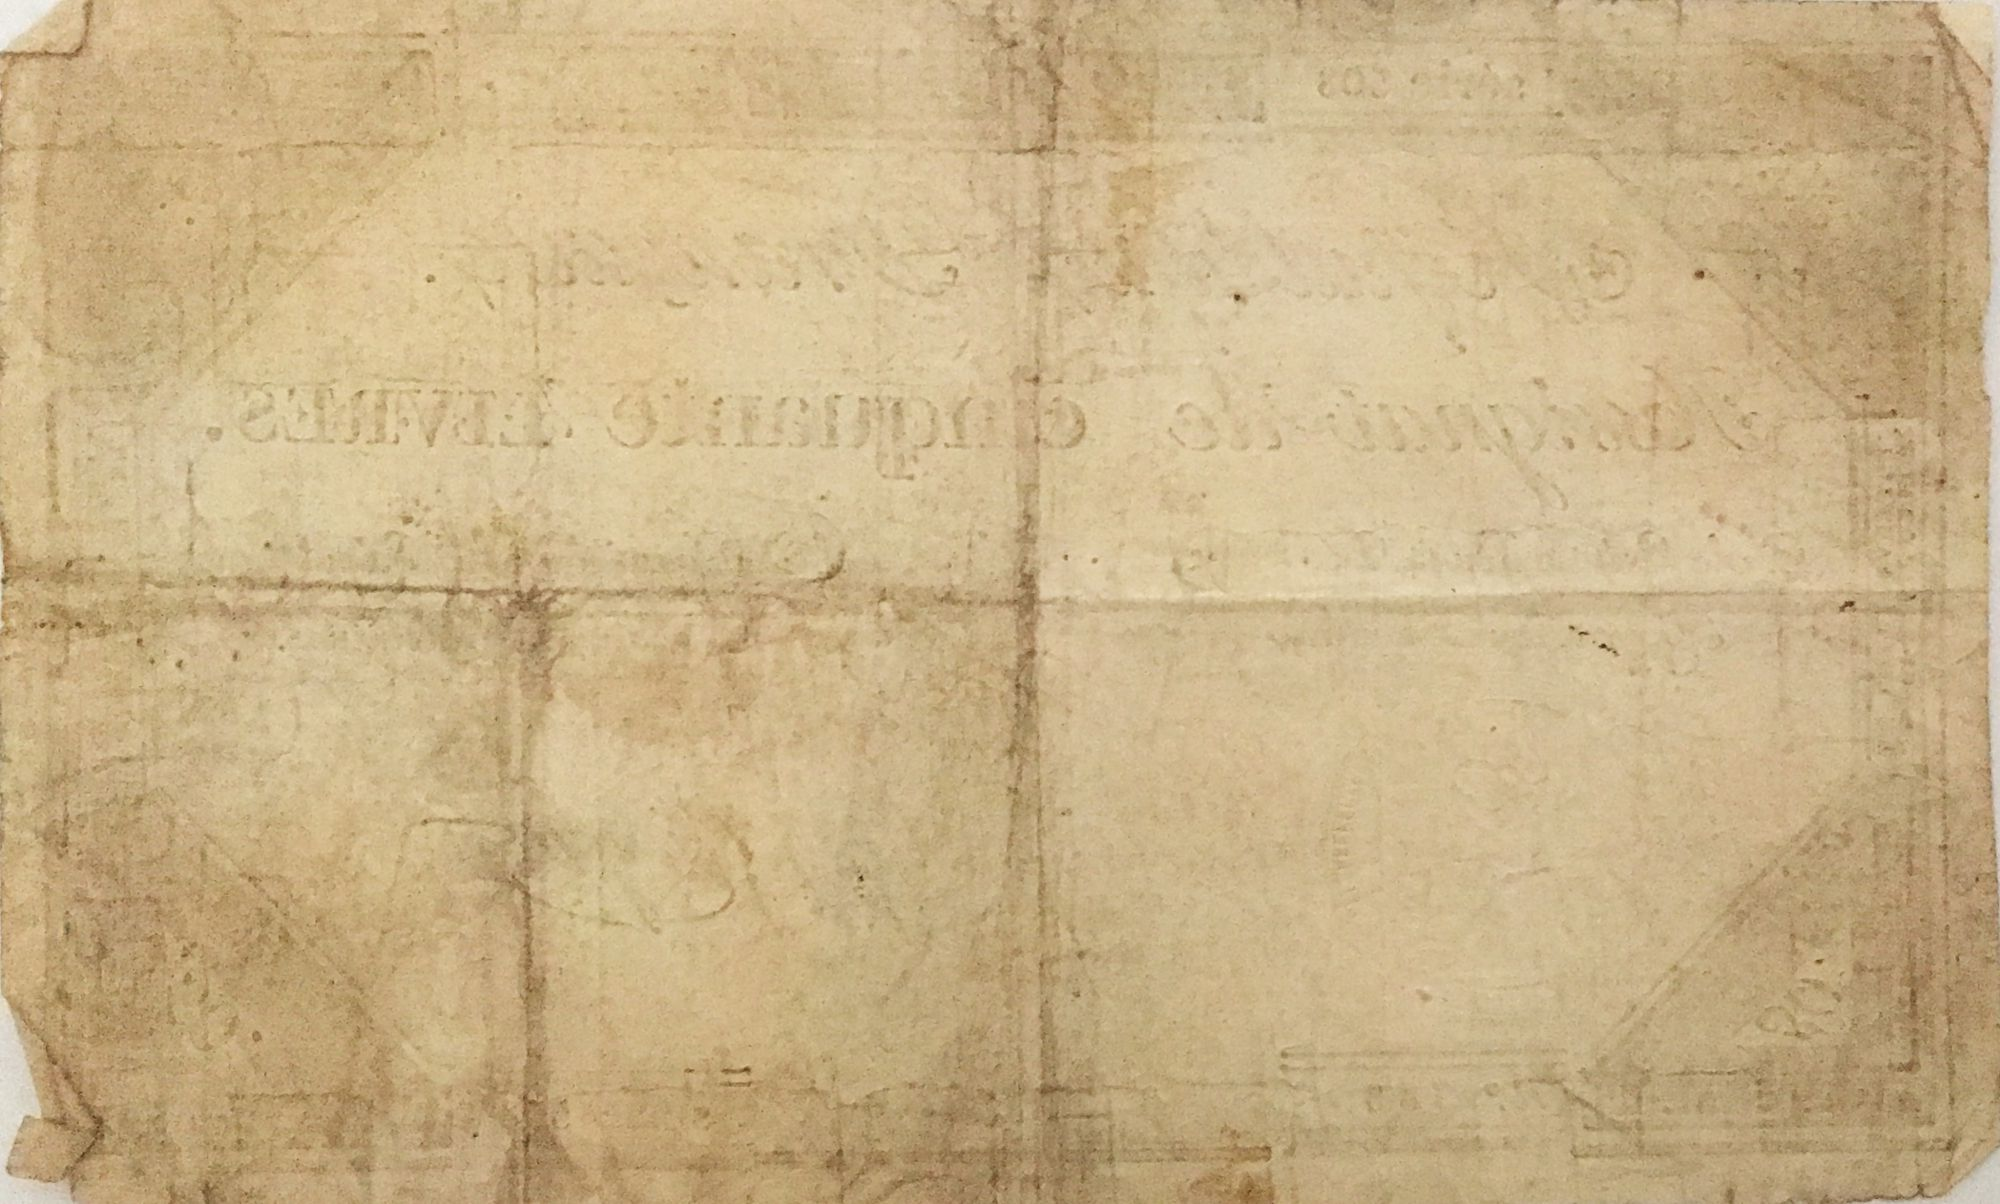 France 50 Livres France assise - 14-12-1792 - Sign. Ringuet - Série 508 - TB